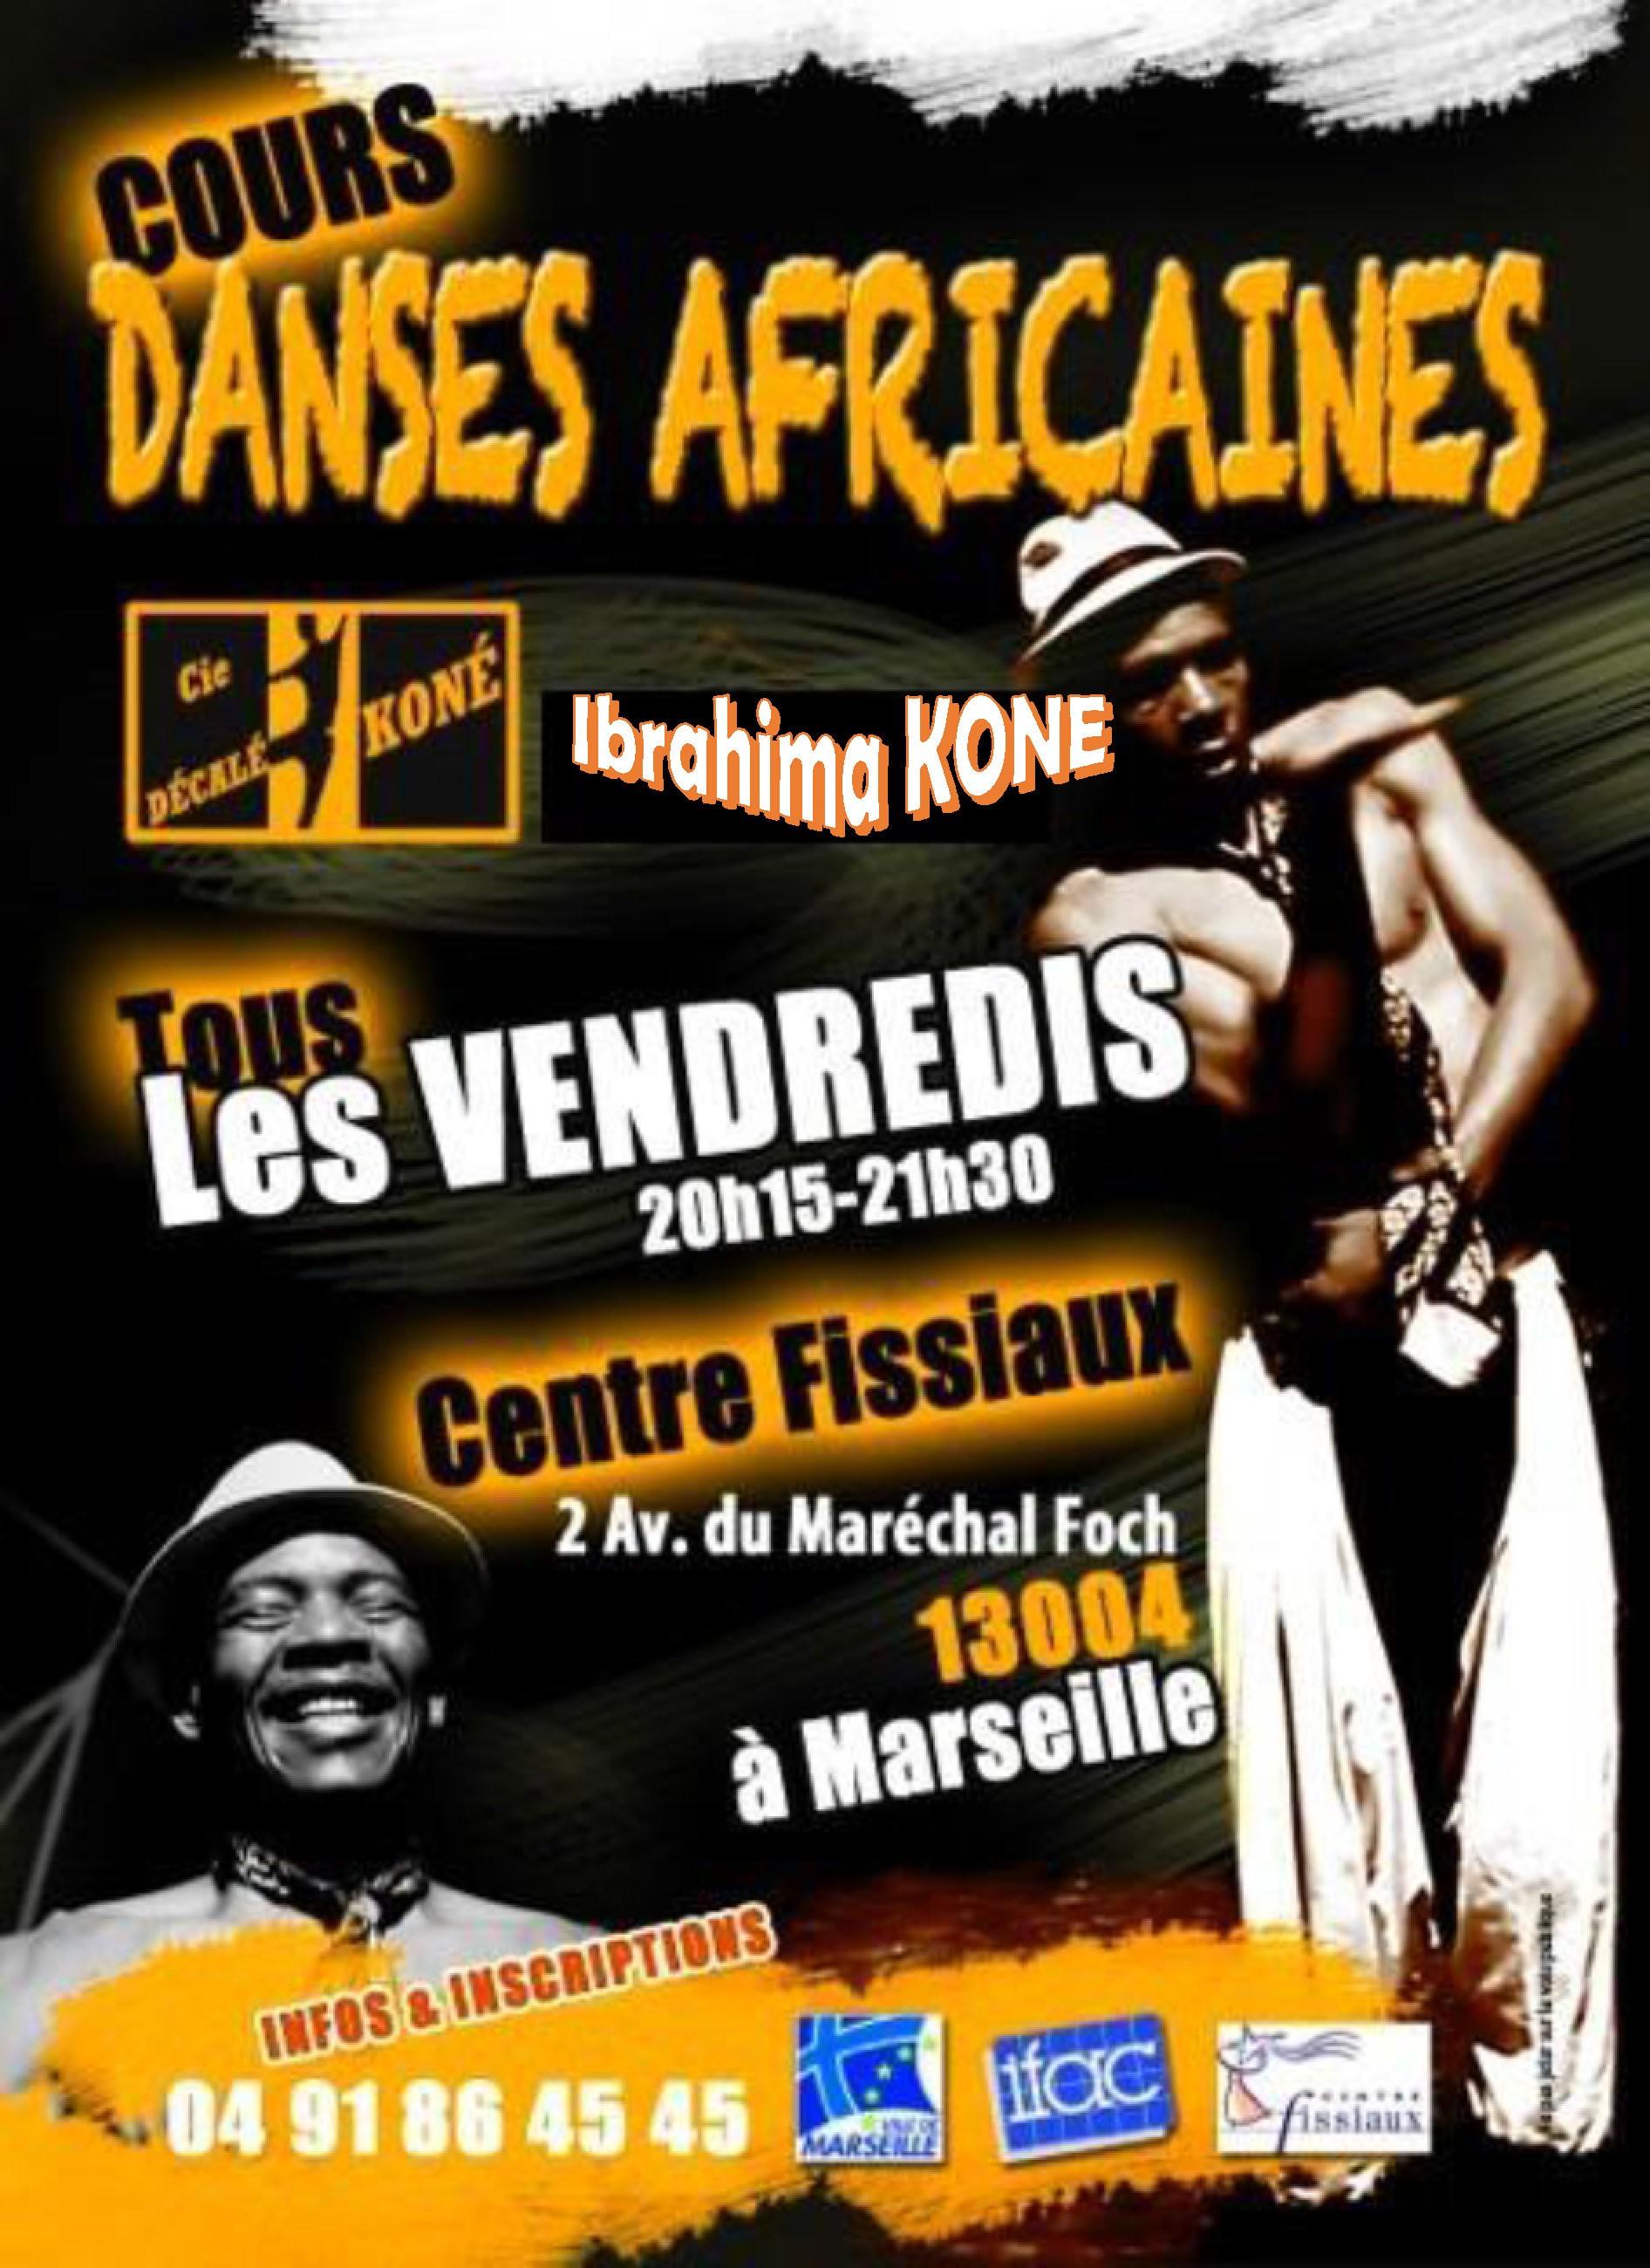 danses-africaines-ibrahima-kone